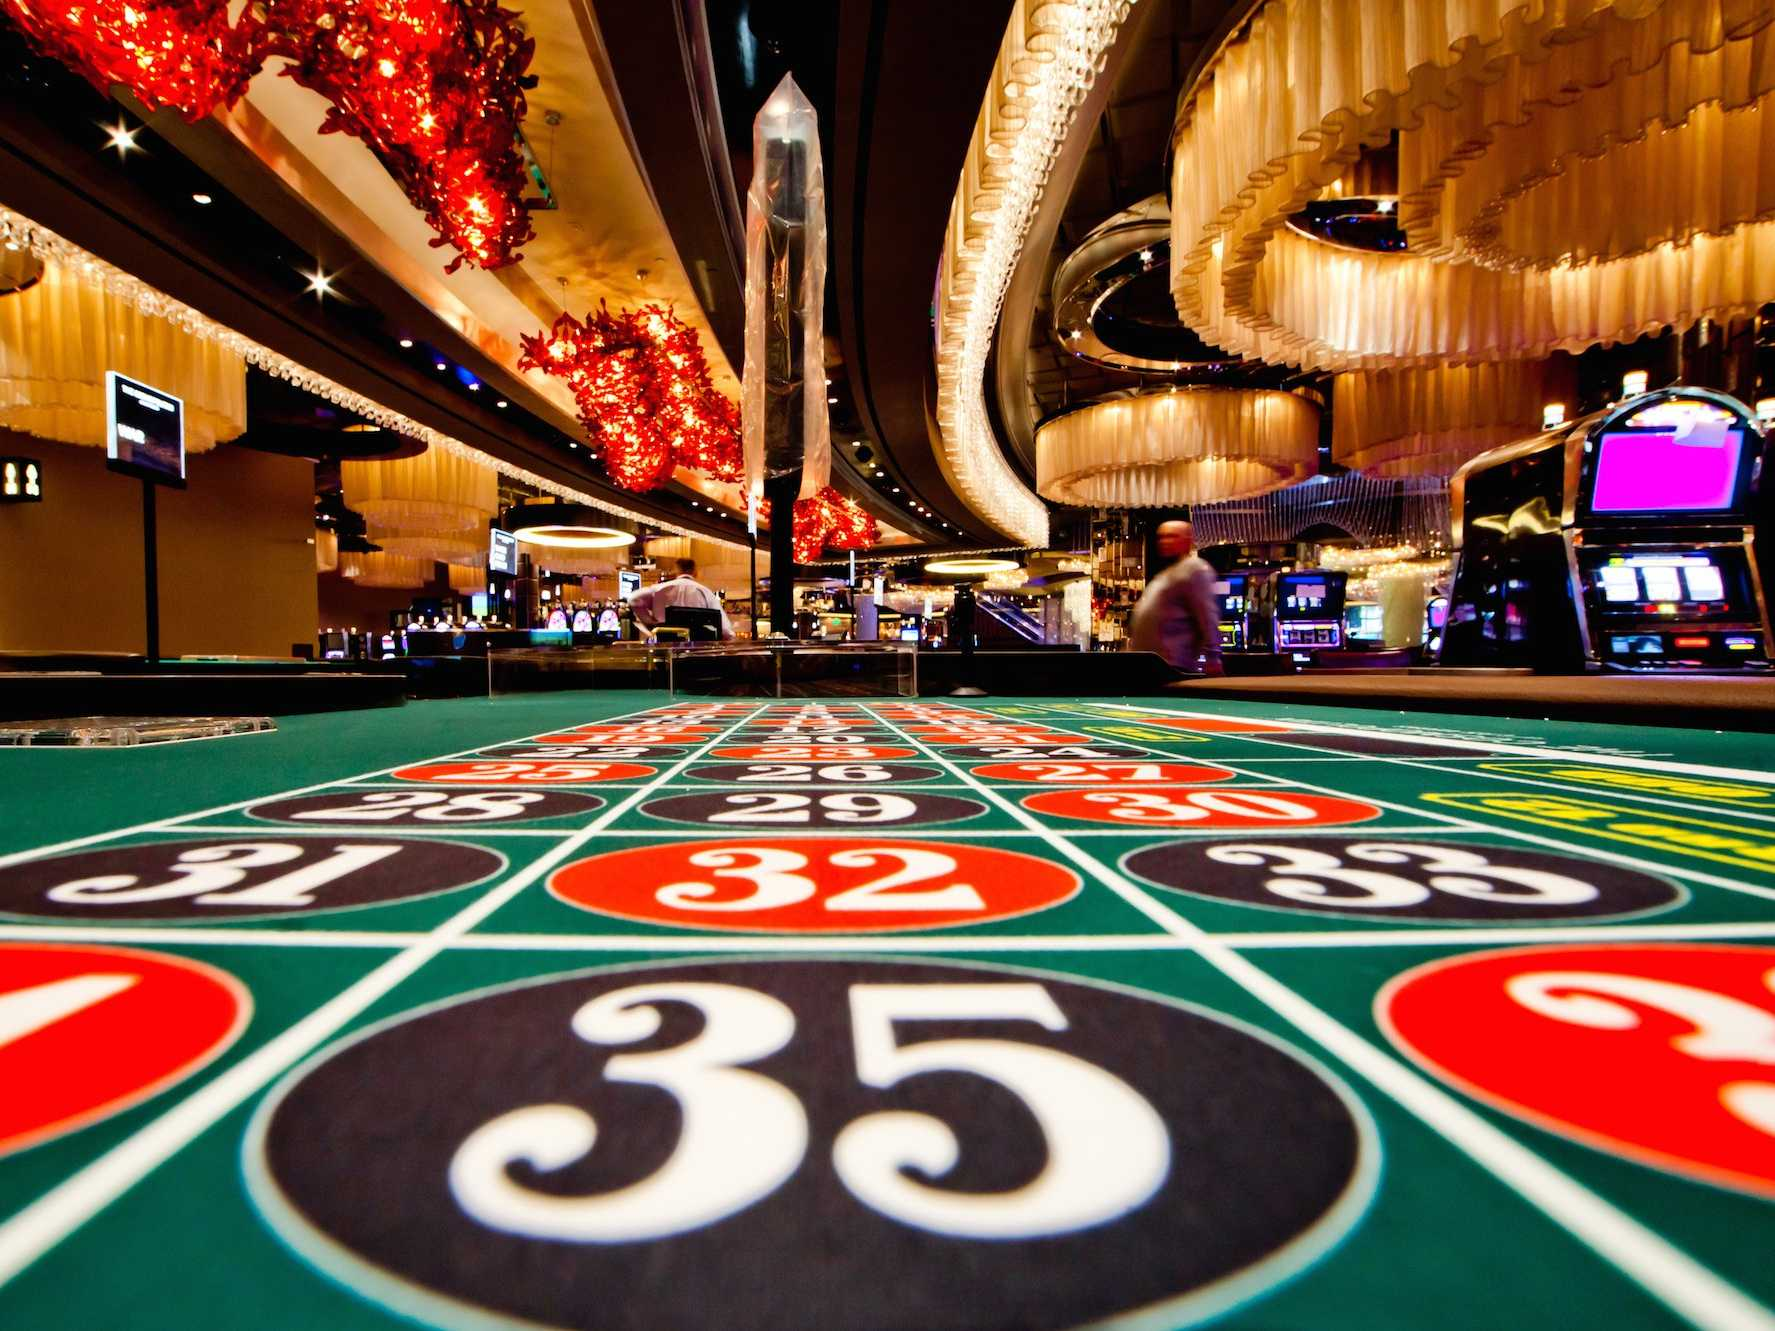 Casino français en ligne : Pourquoi choisir ce genre de casino ?